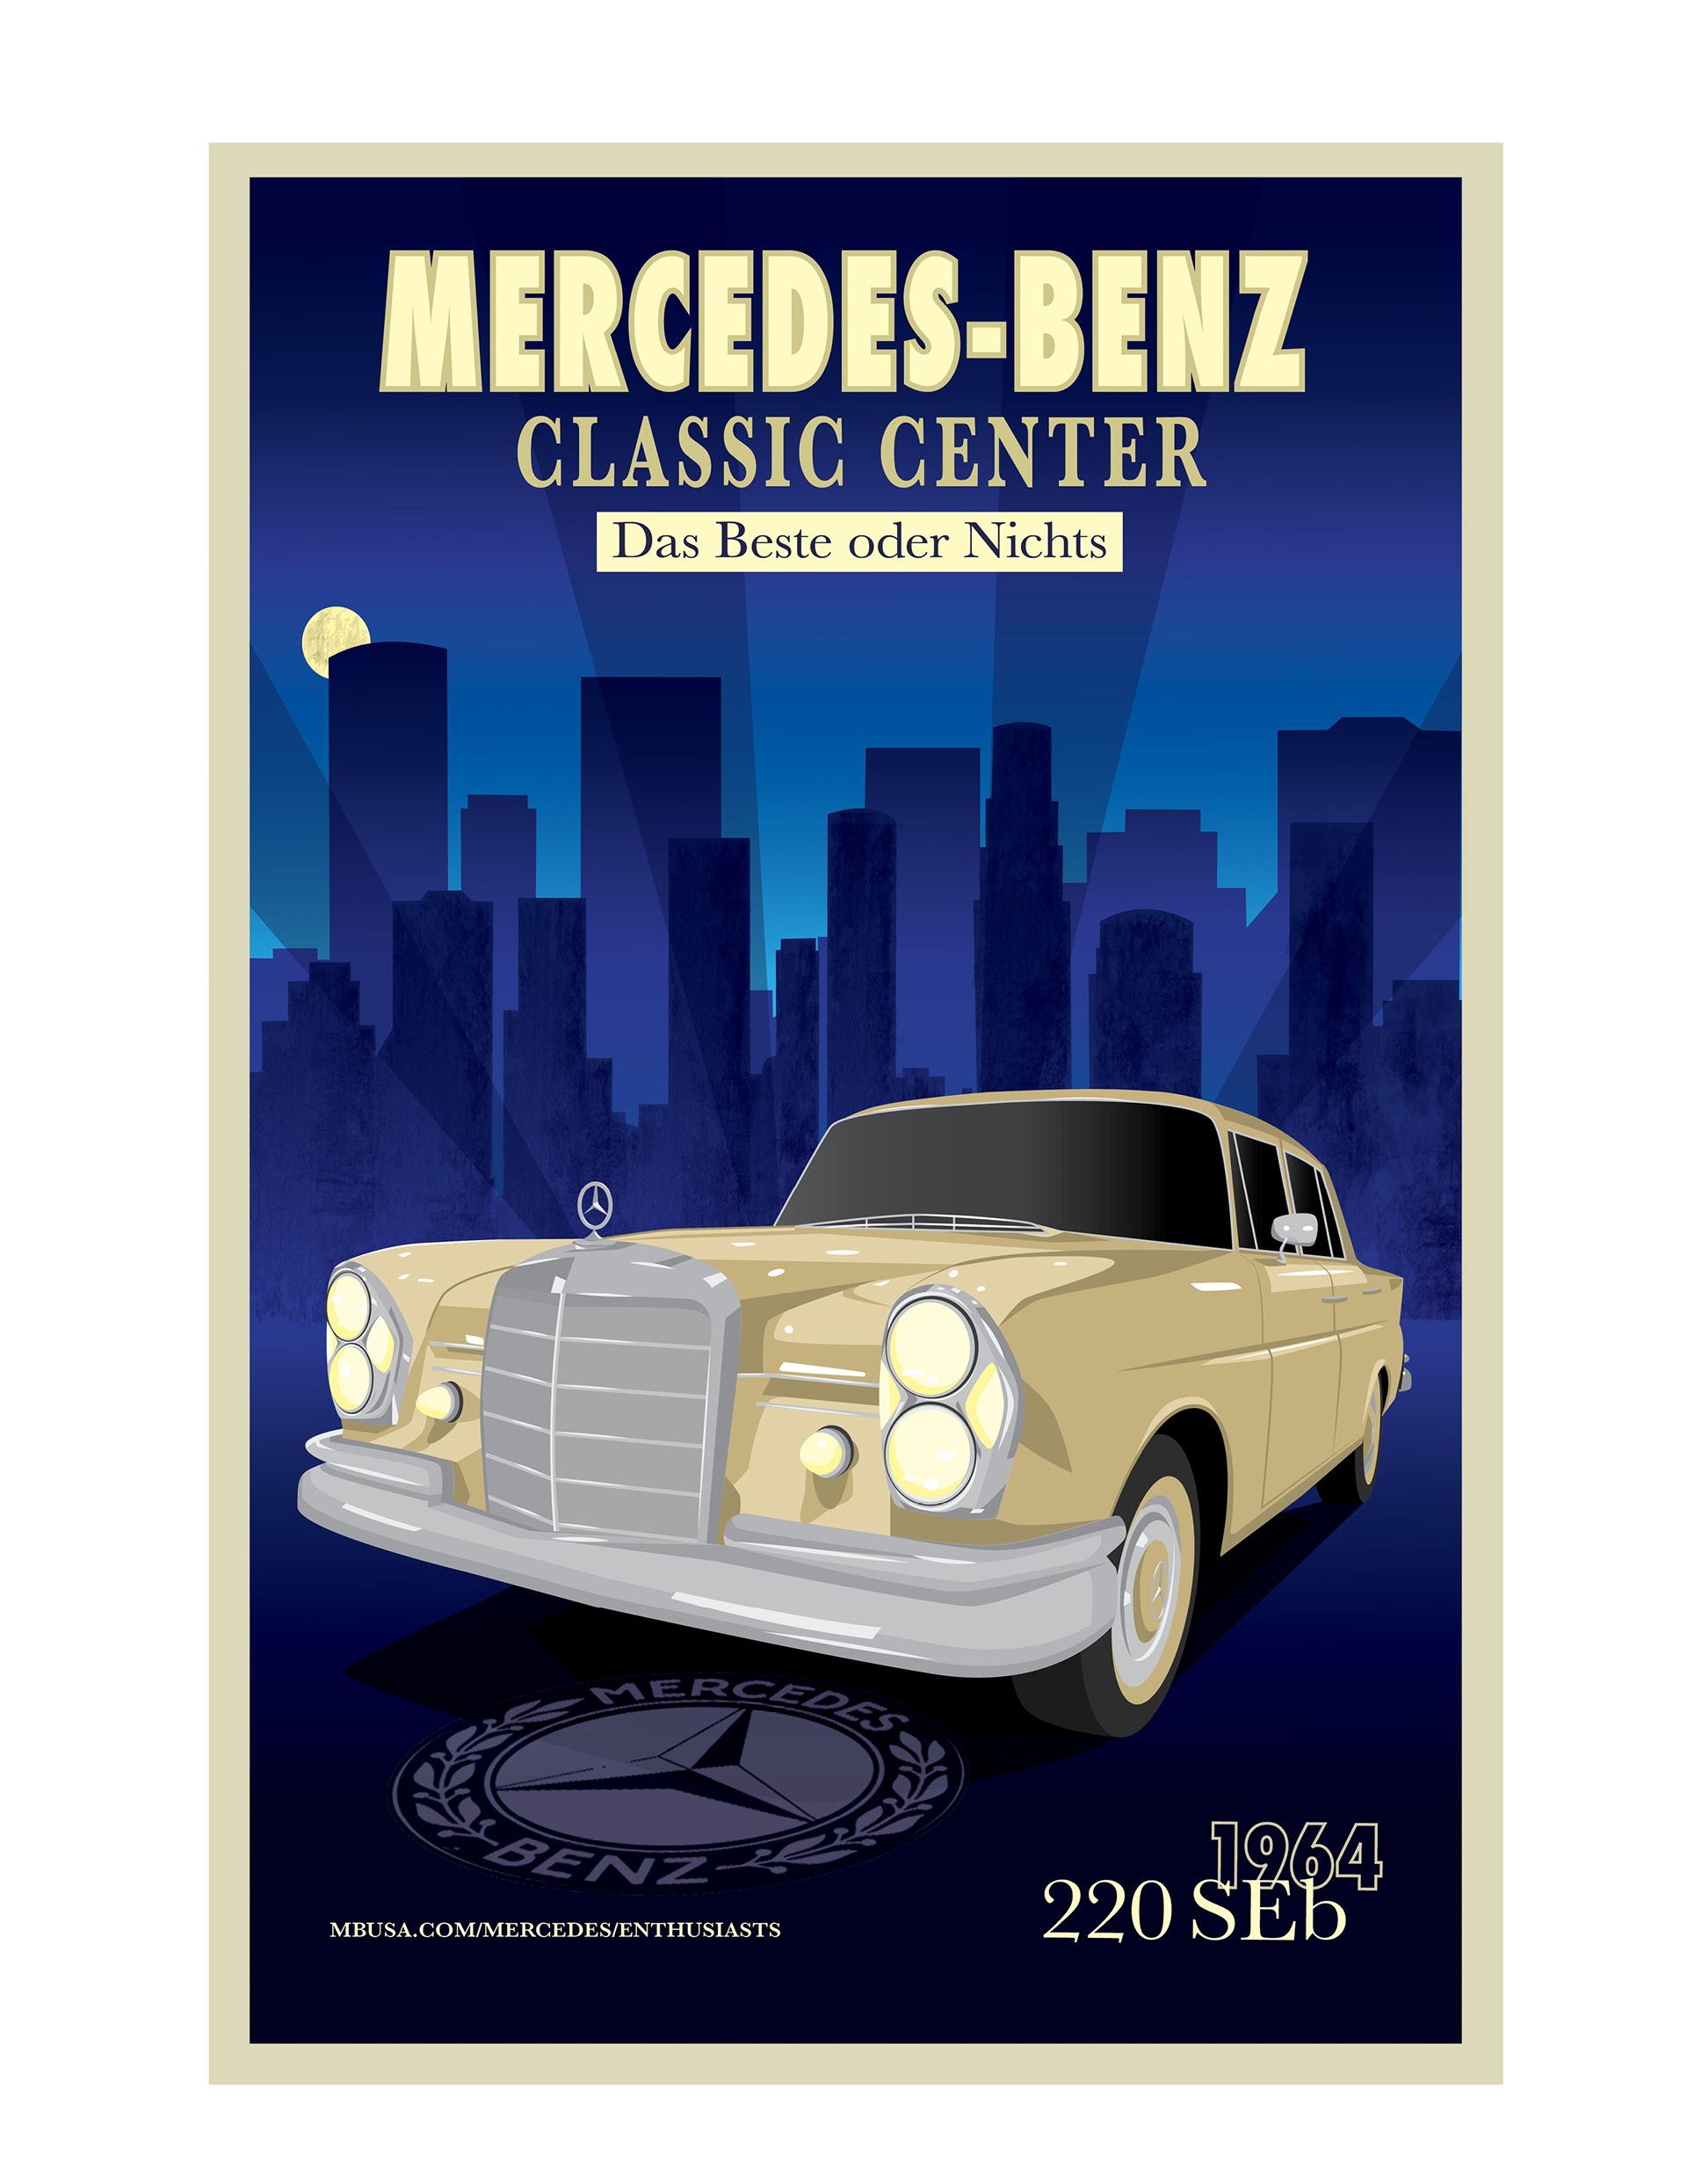 erin hiromoto mercedes benz classic center poster